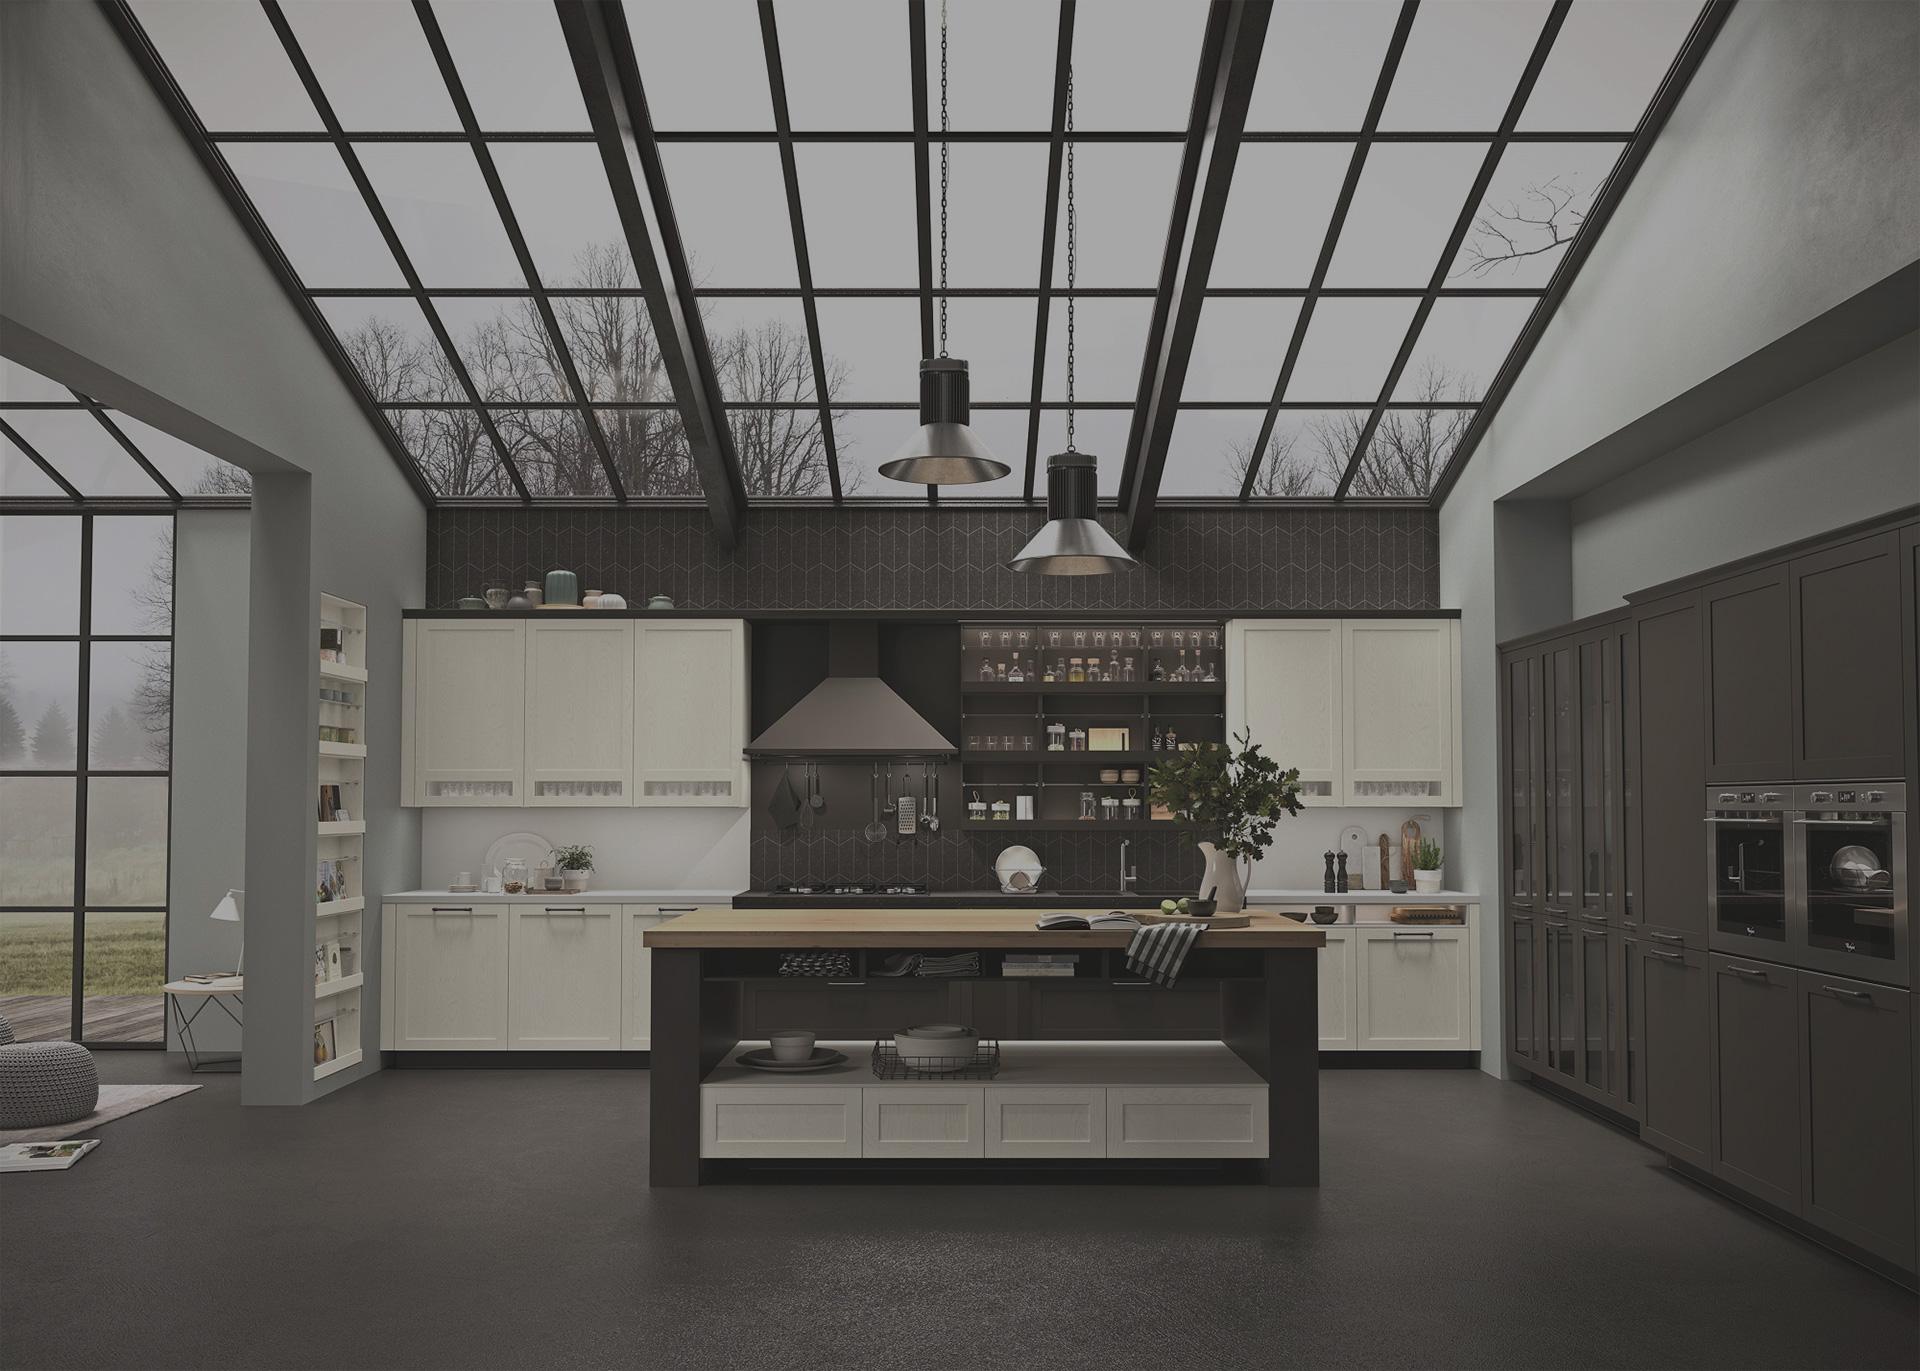 cucina-snaidero-hero-sistema-isola